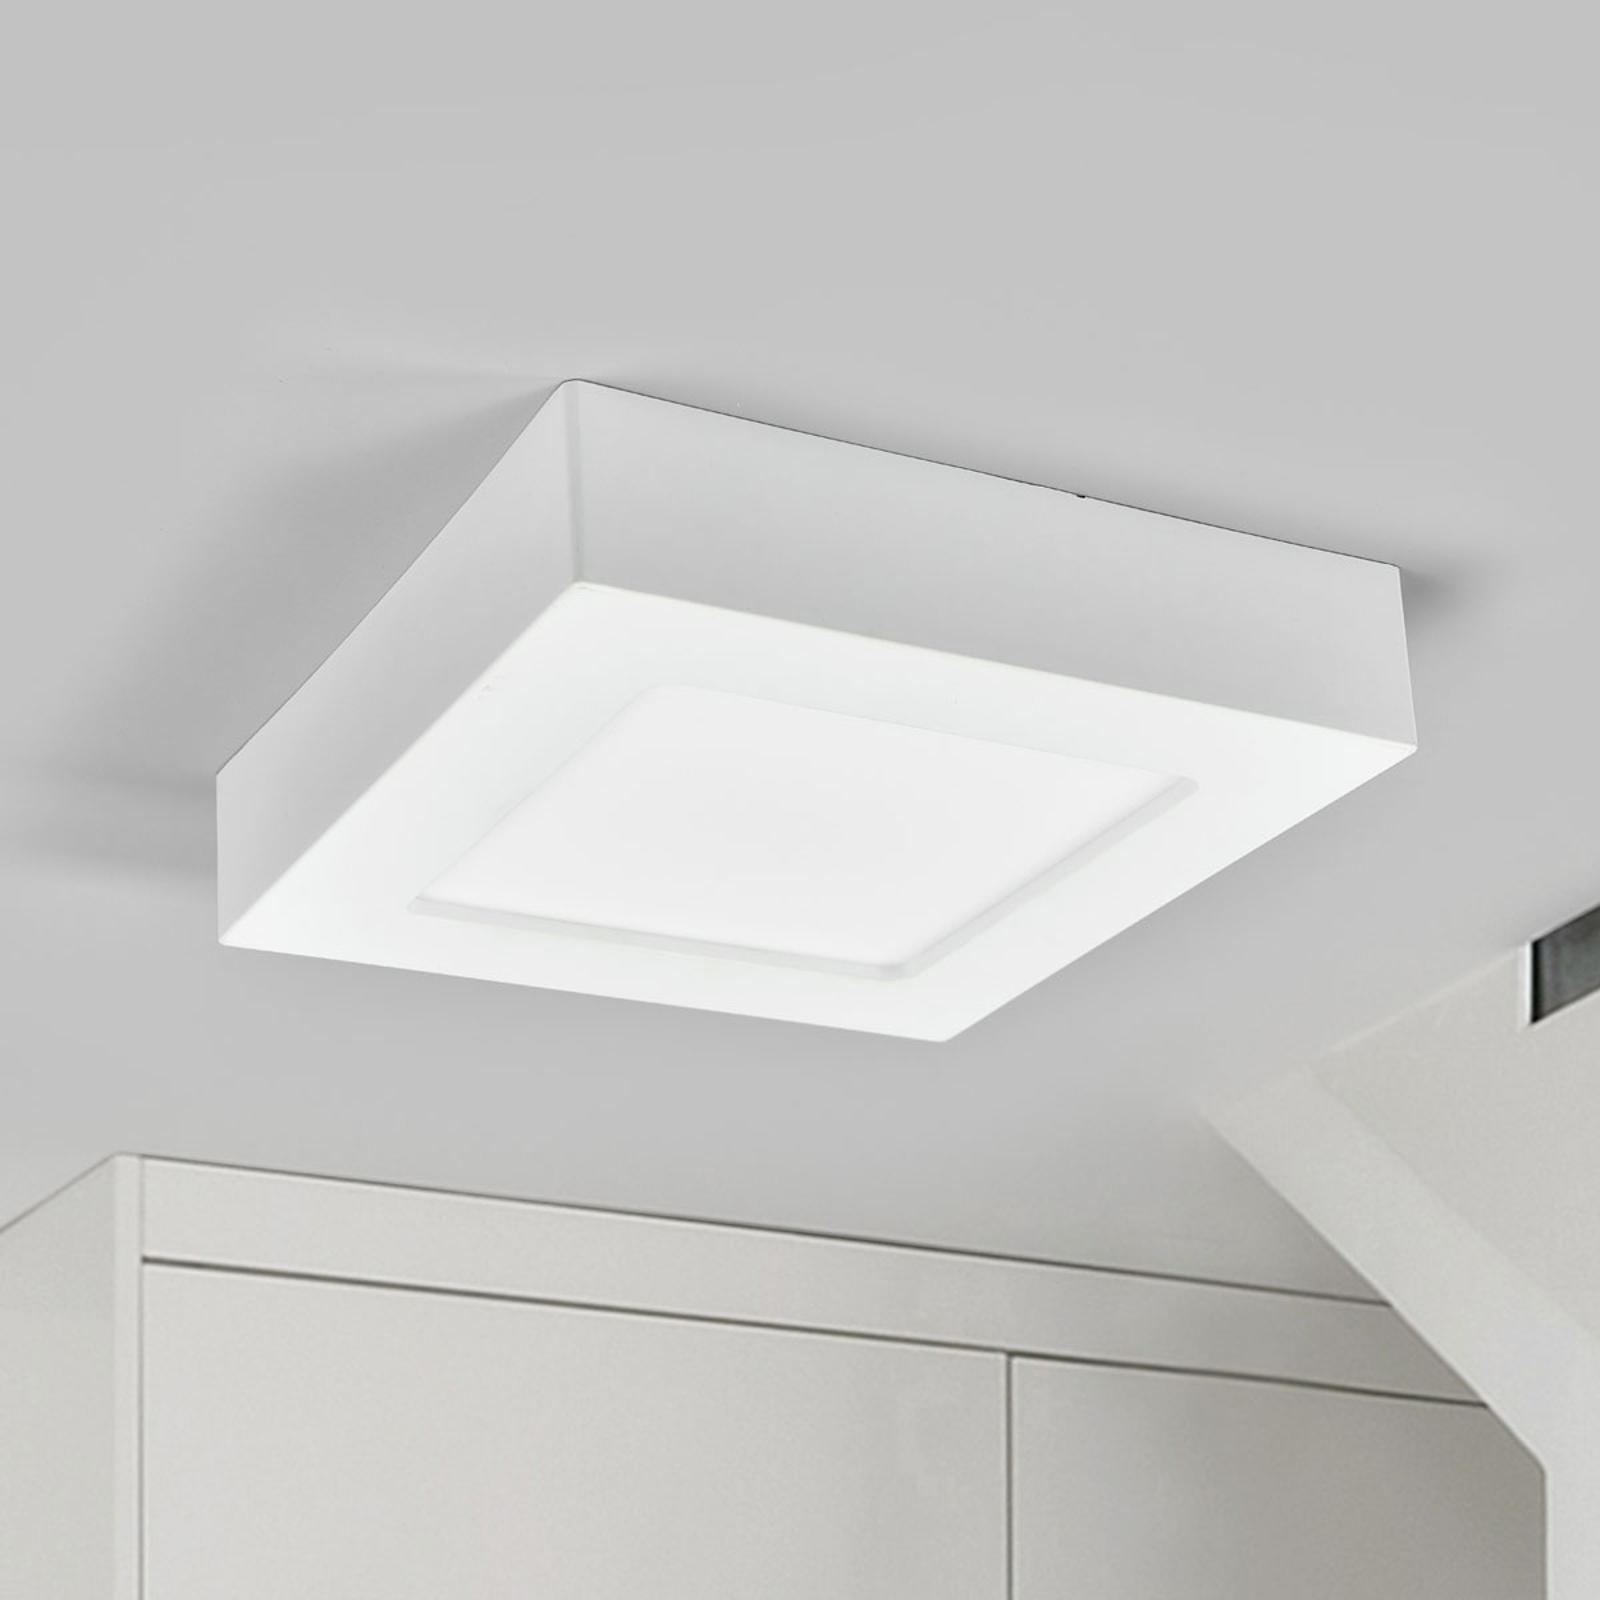 Plafonnier LED Marlo blanc 4000K angulaire 18,1cm